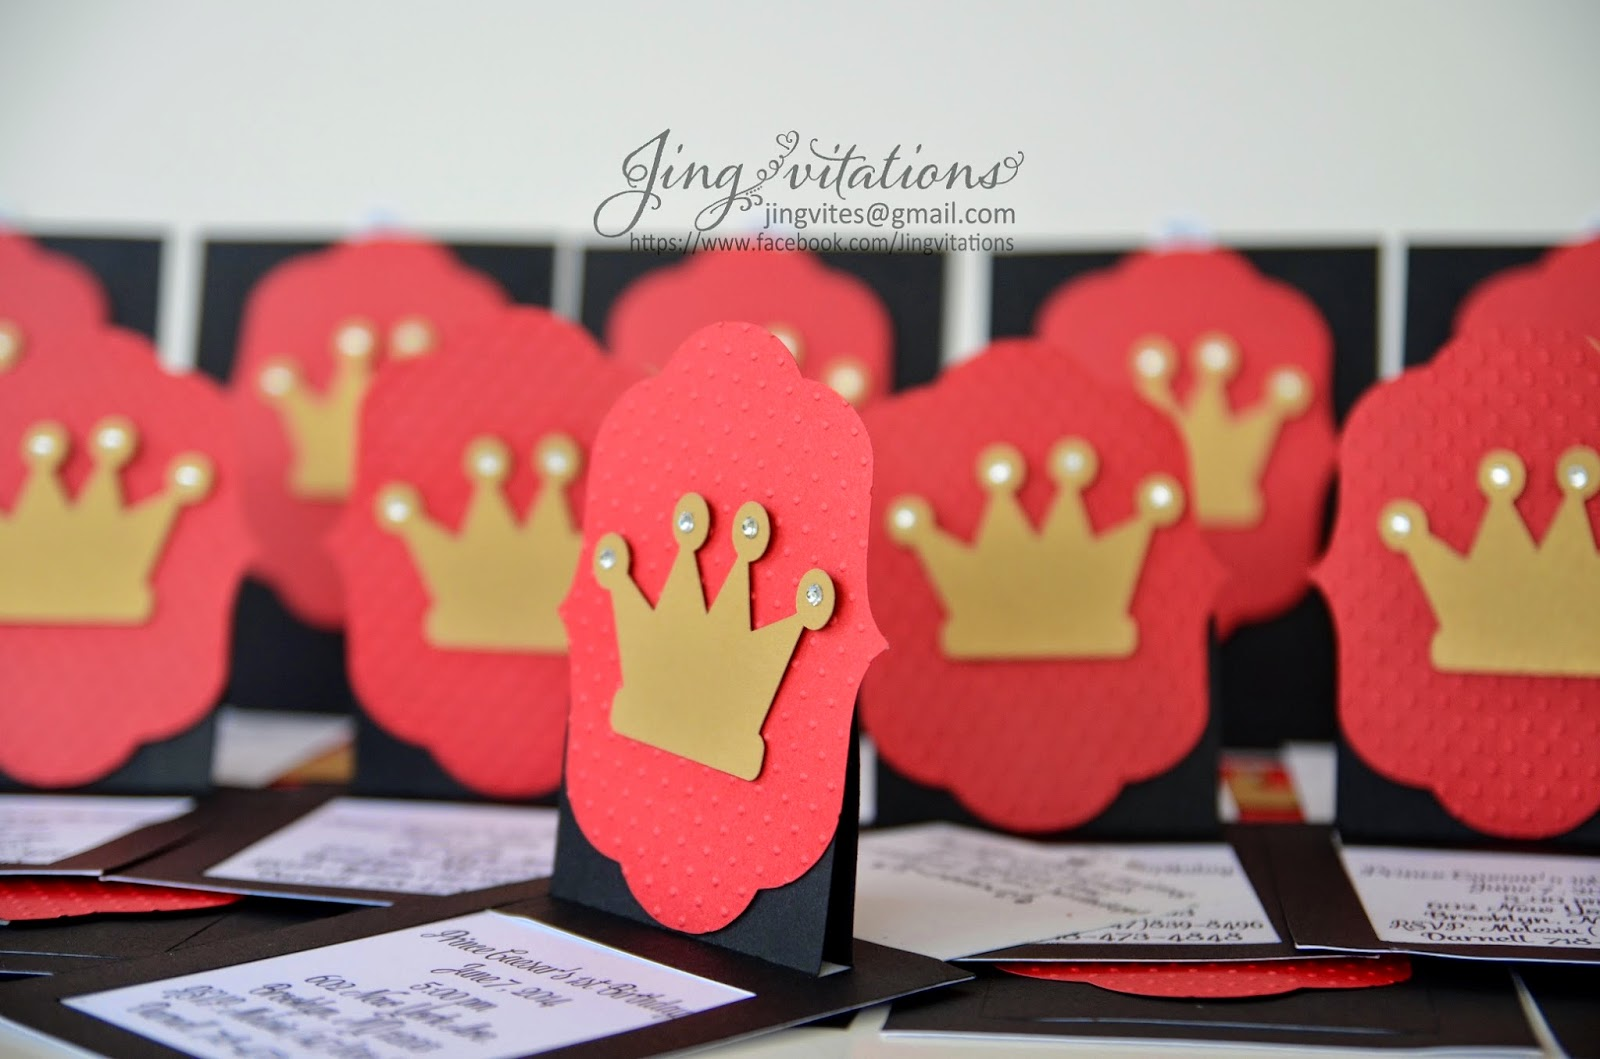 Jingvitations: First Birthday Invitations - Crown Design